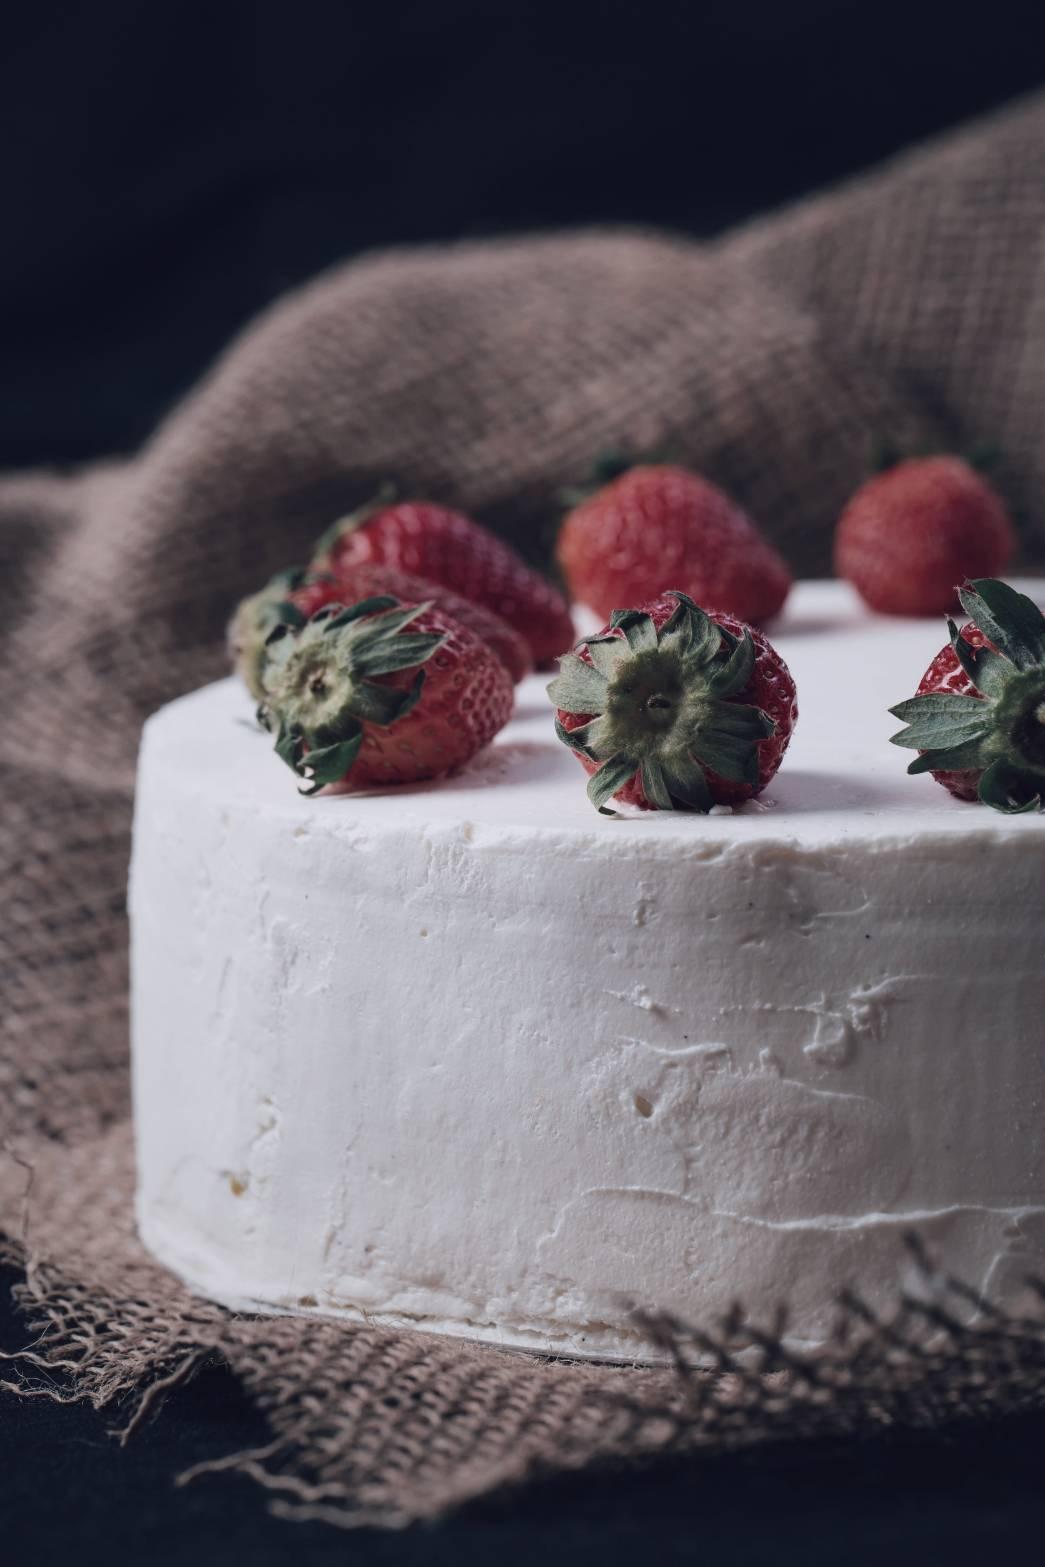 STRAWBERRYSHORT CAKE - Yummy berry muchhhhh!